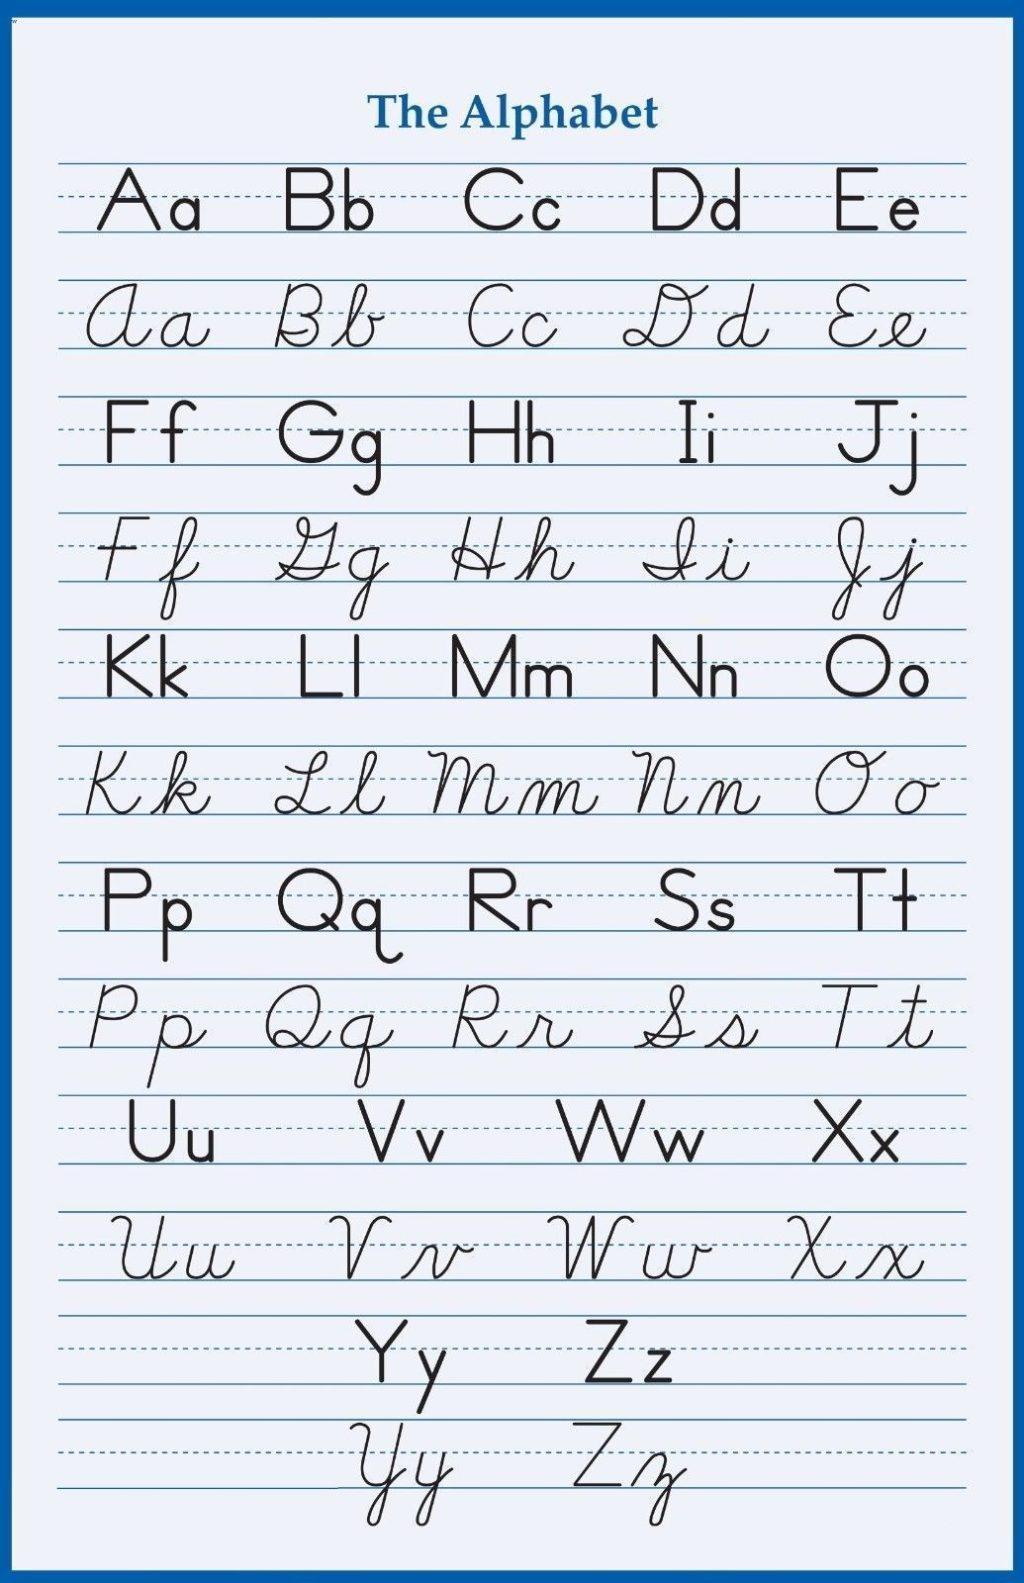 Worksheet ~ Worksheetphabet Handwriting Cursive Poster X And